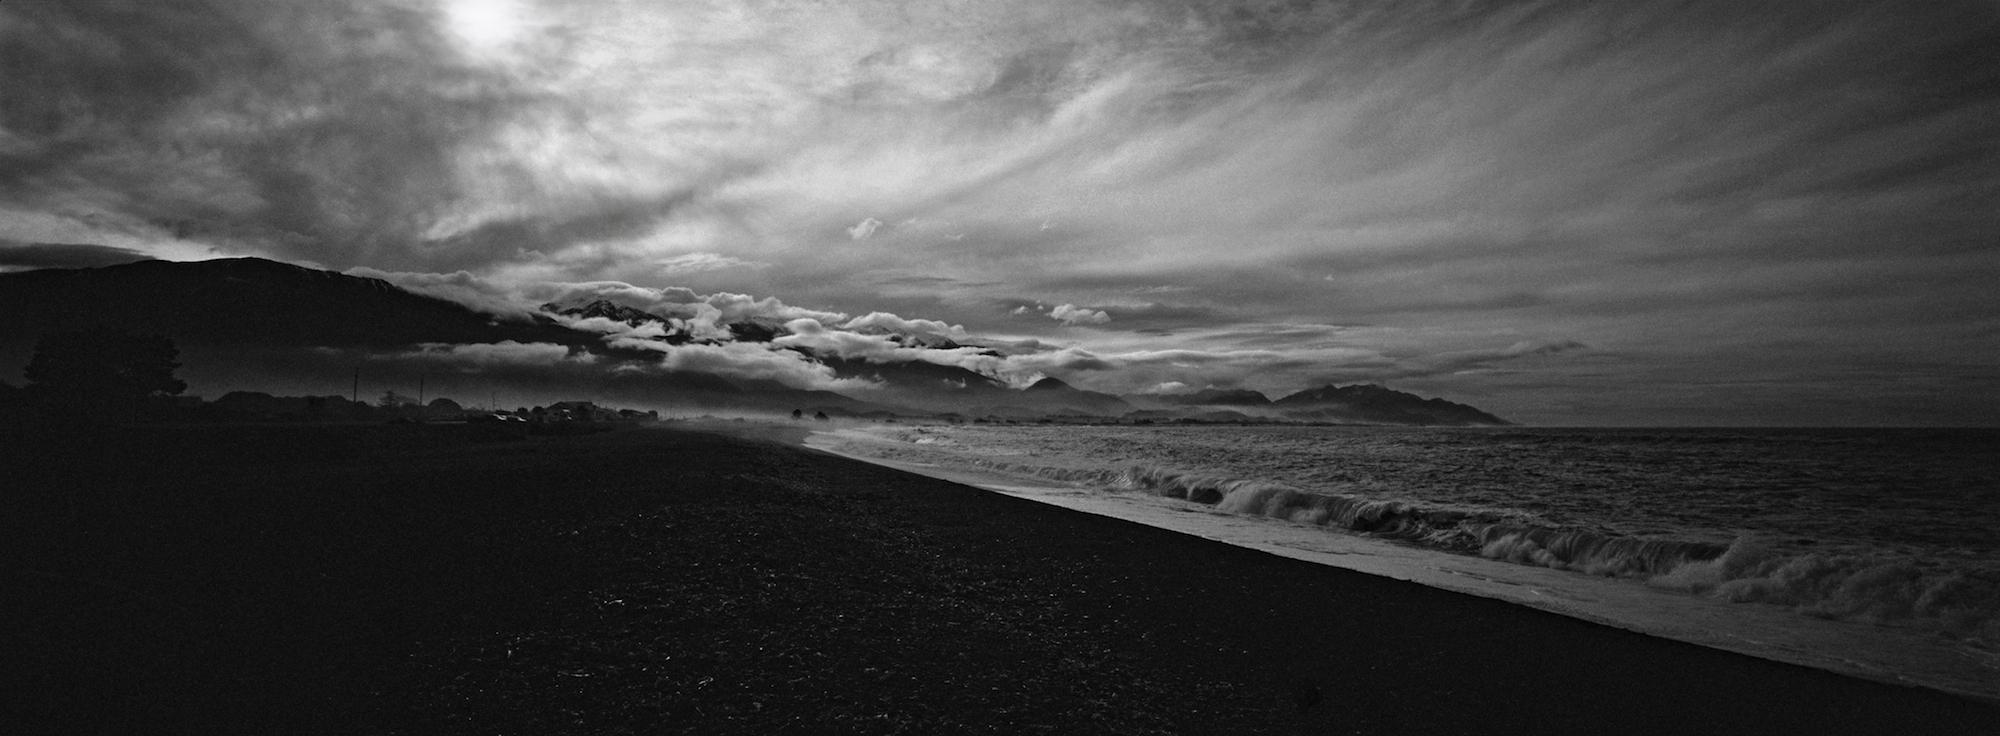 Clouds 2: Xpan